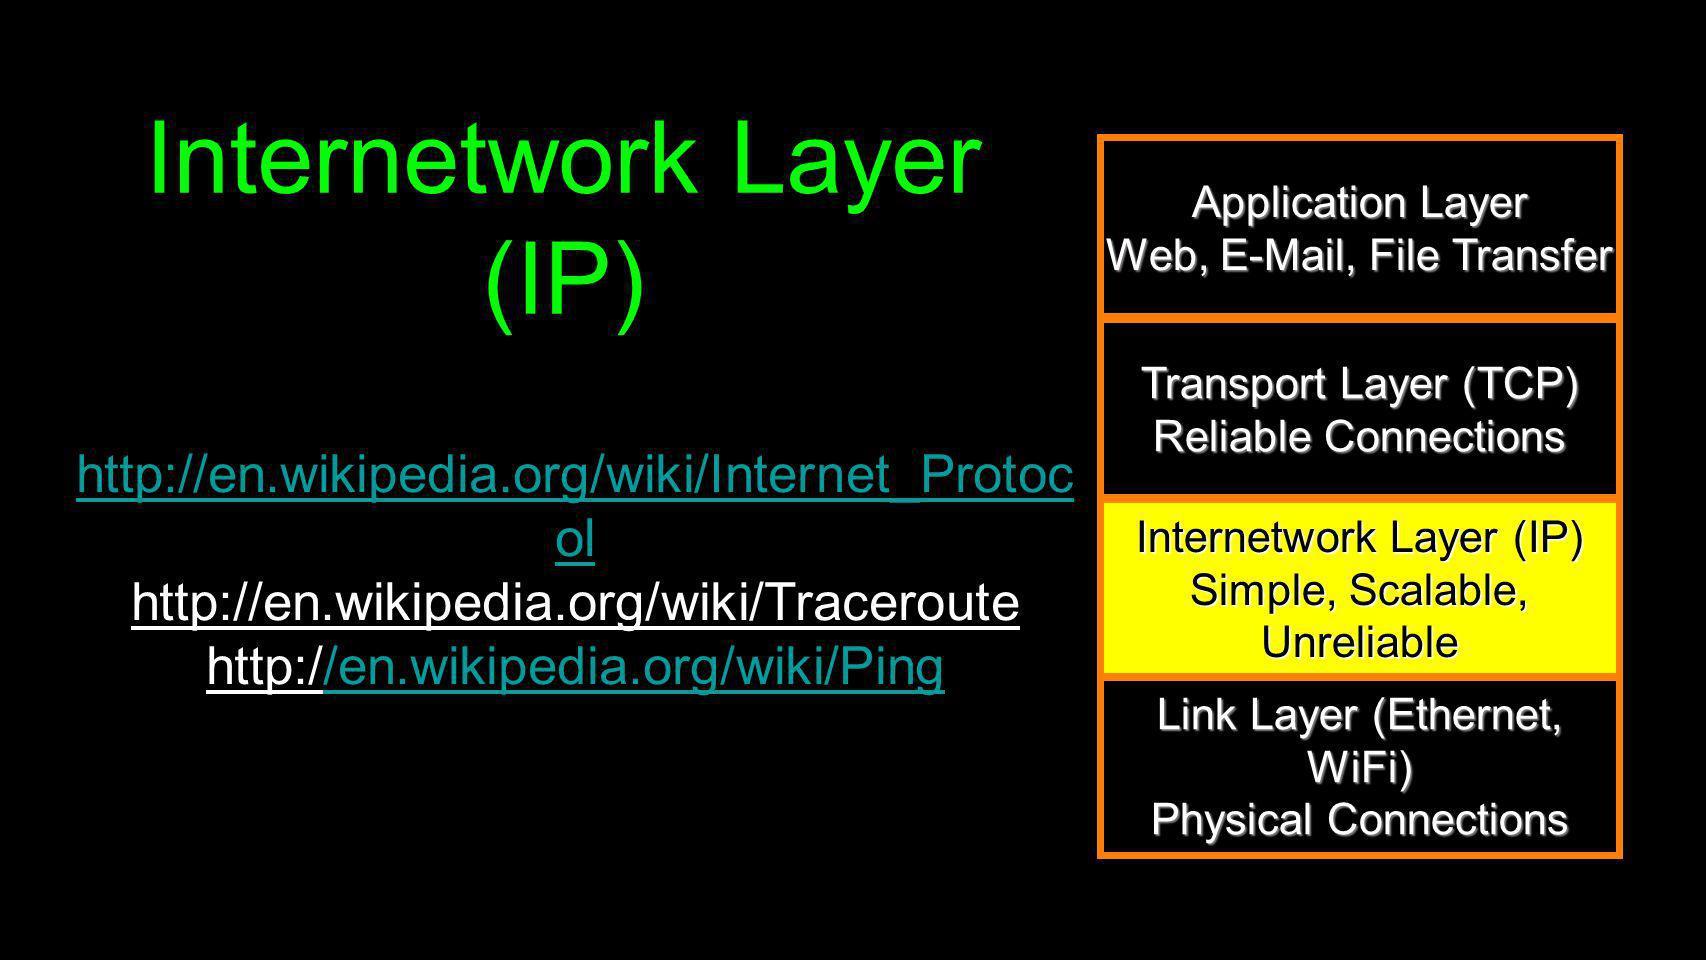 Internetwork Layer (IP)